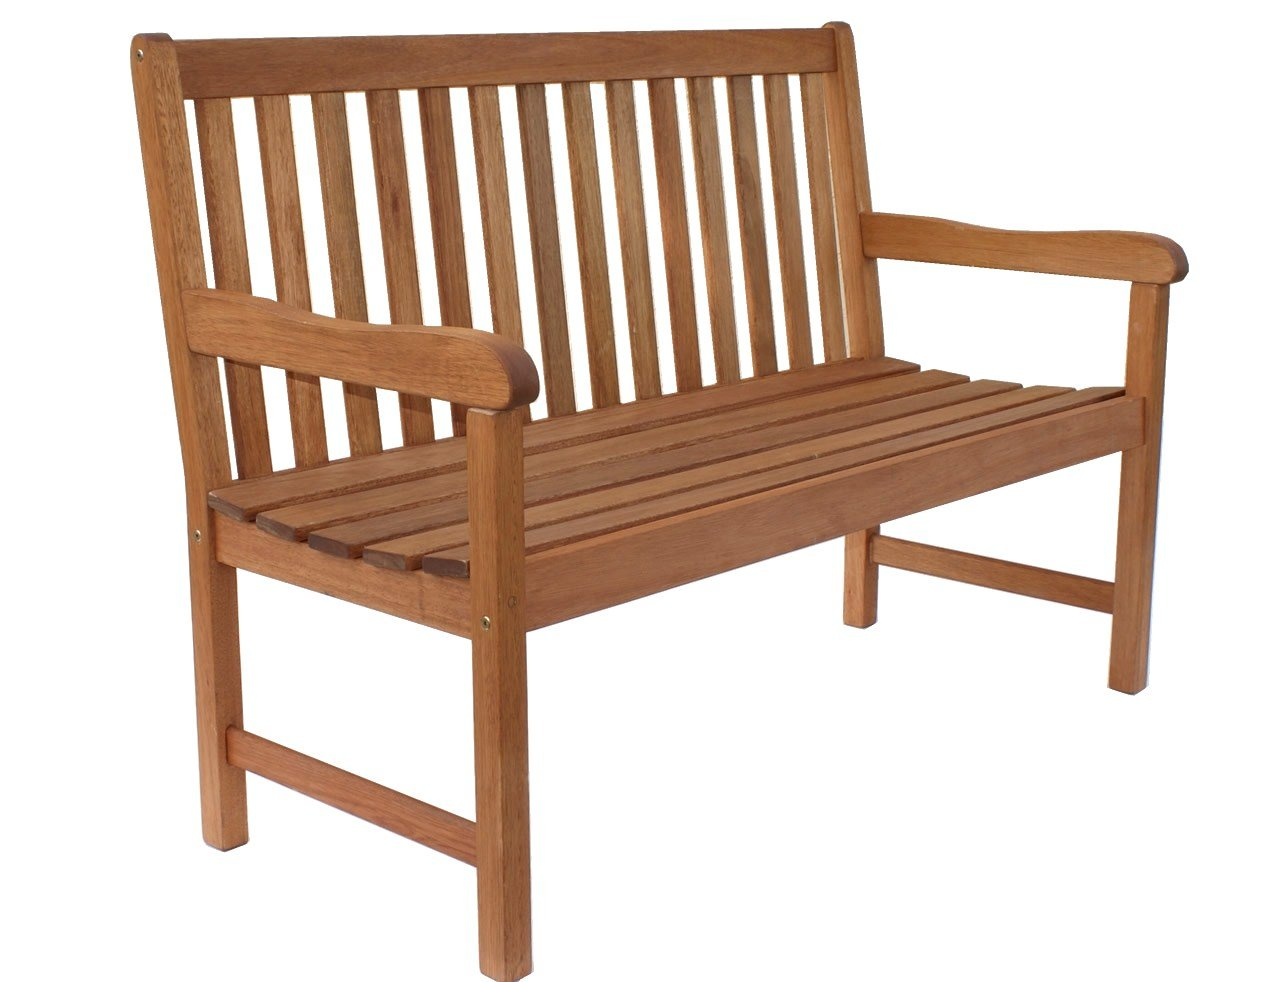 Amazonia Milano 4-Feet Eucalyptus Bench - Outdoor Patio Furniture